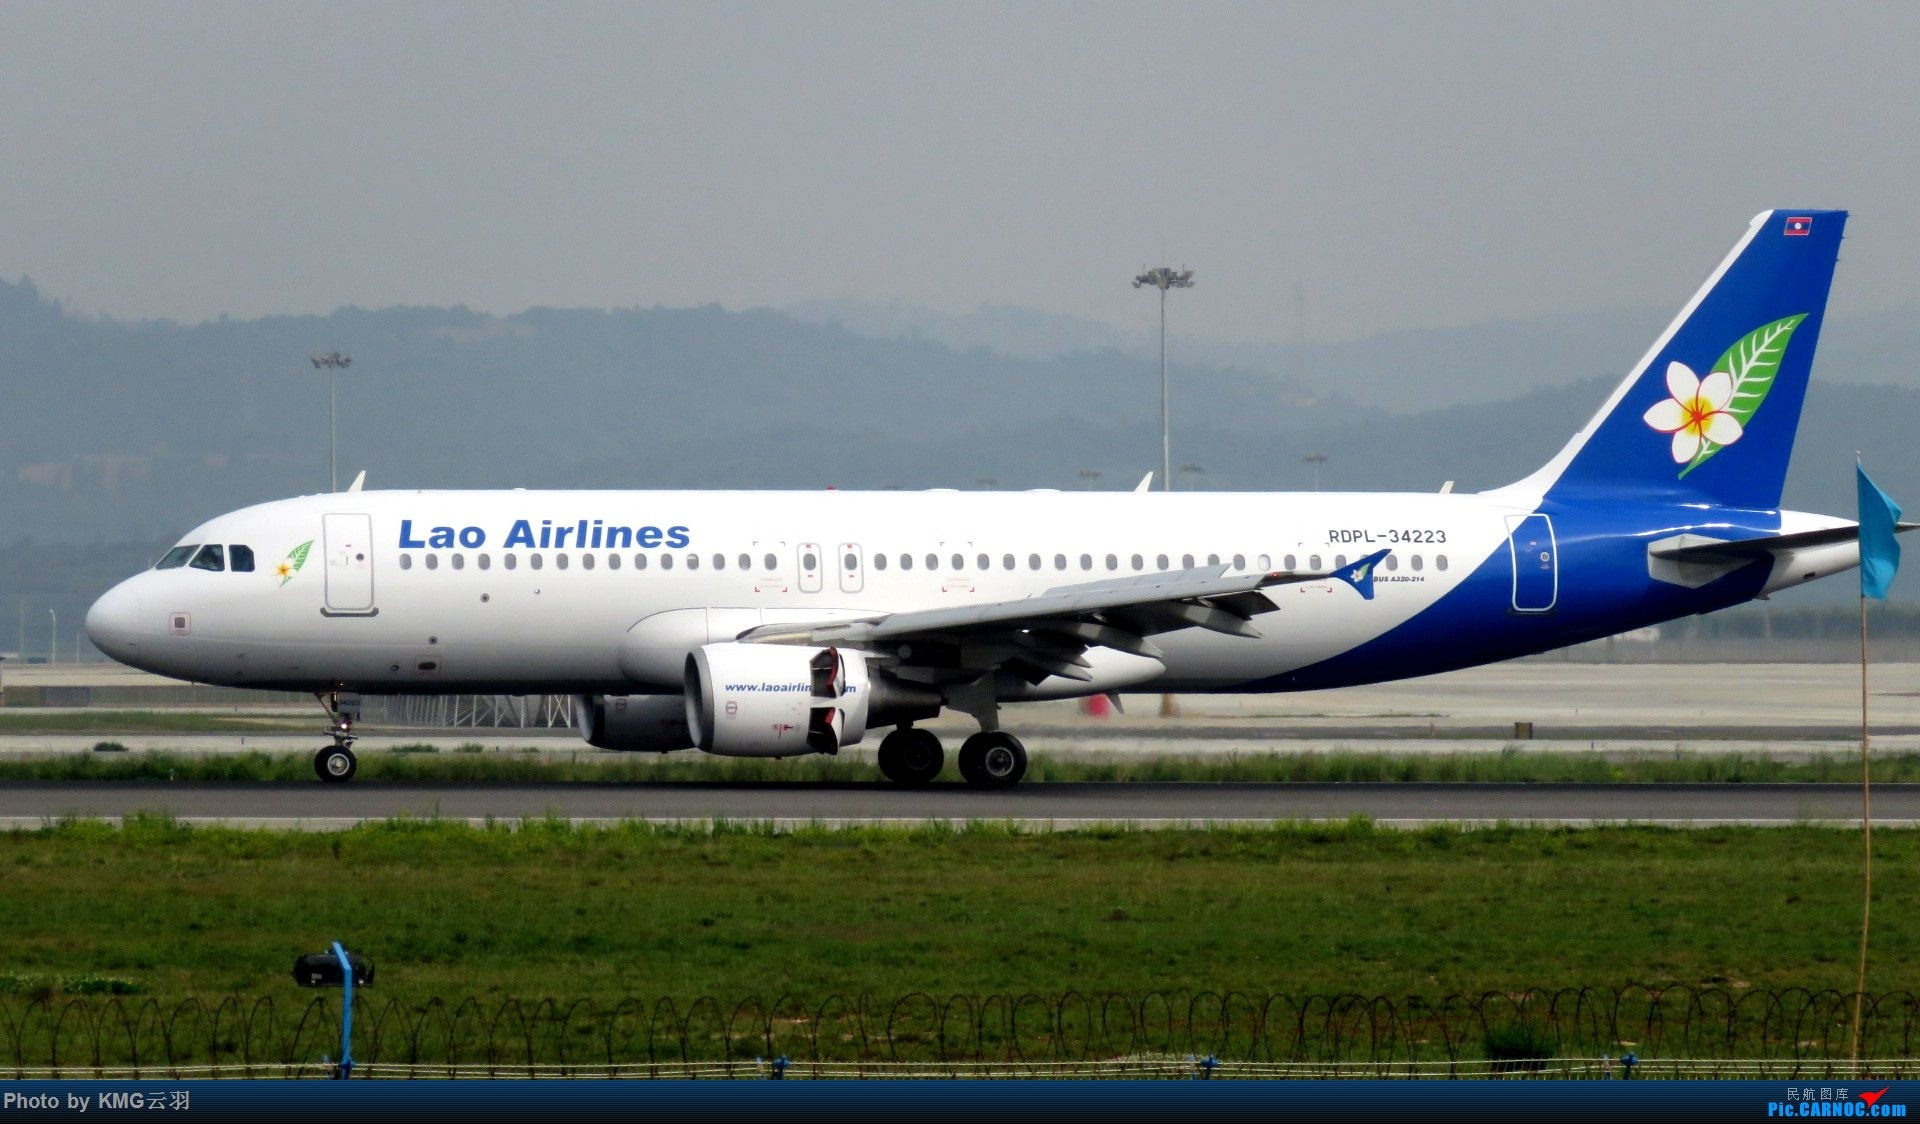 Re:[原创]KMG东跑随拍 AIRBUS A320-200 RDPL-34223 中国昆明长水国际机场